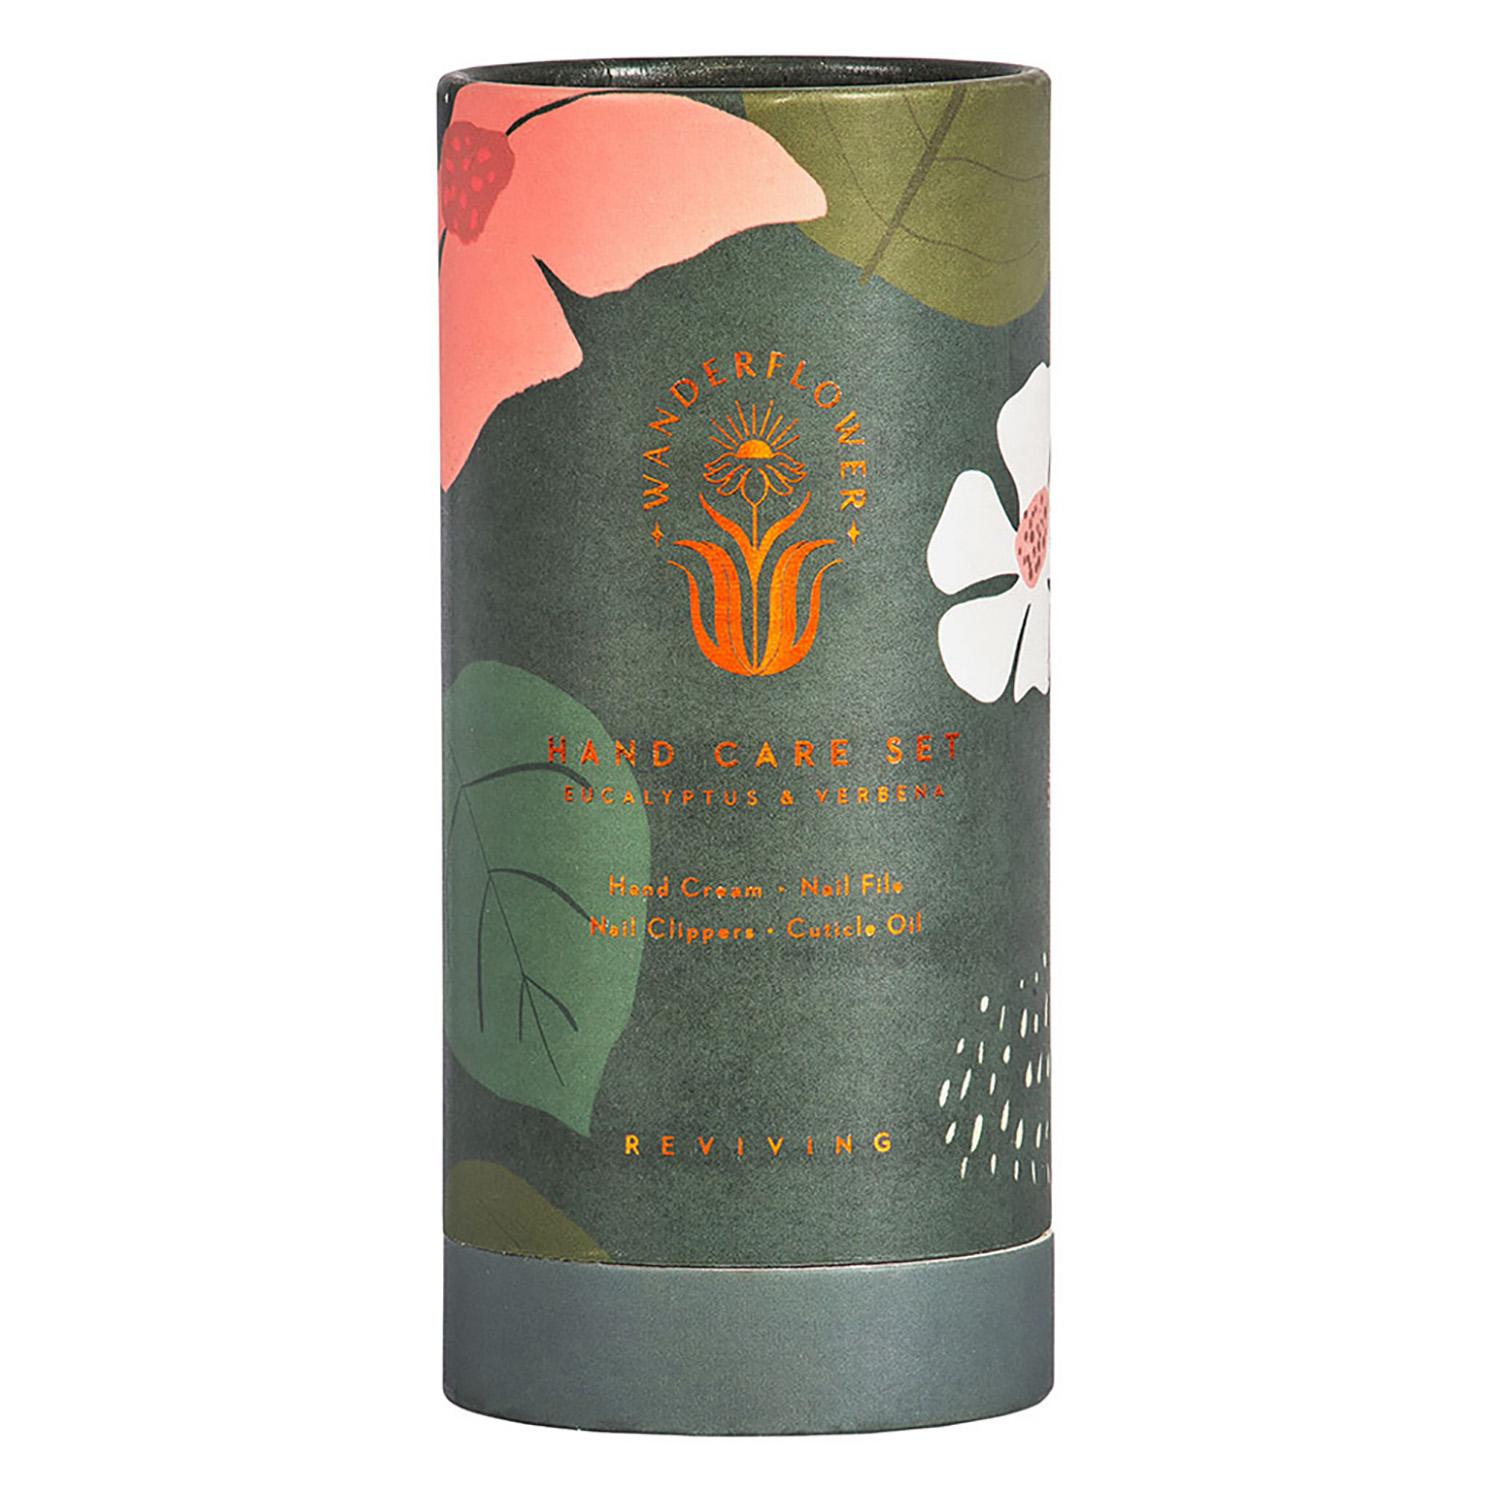 Wanderflower – Eucalyptus & Verbena Travel Hand Care Set in Presentation Tube